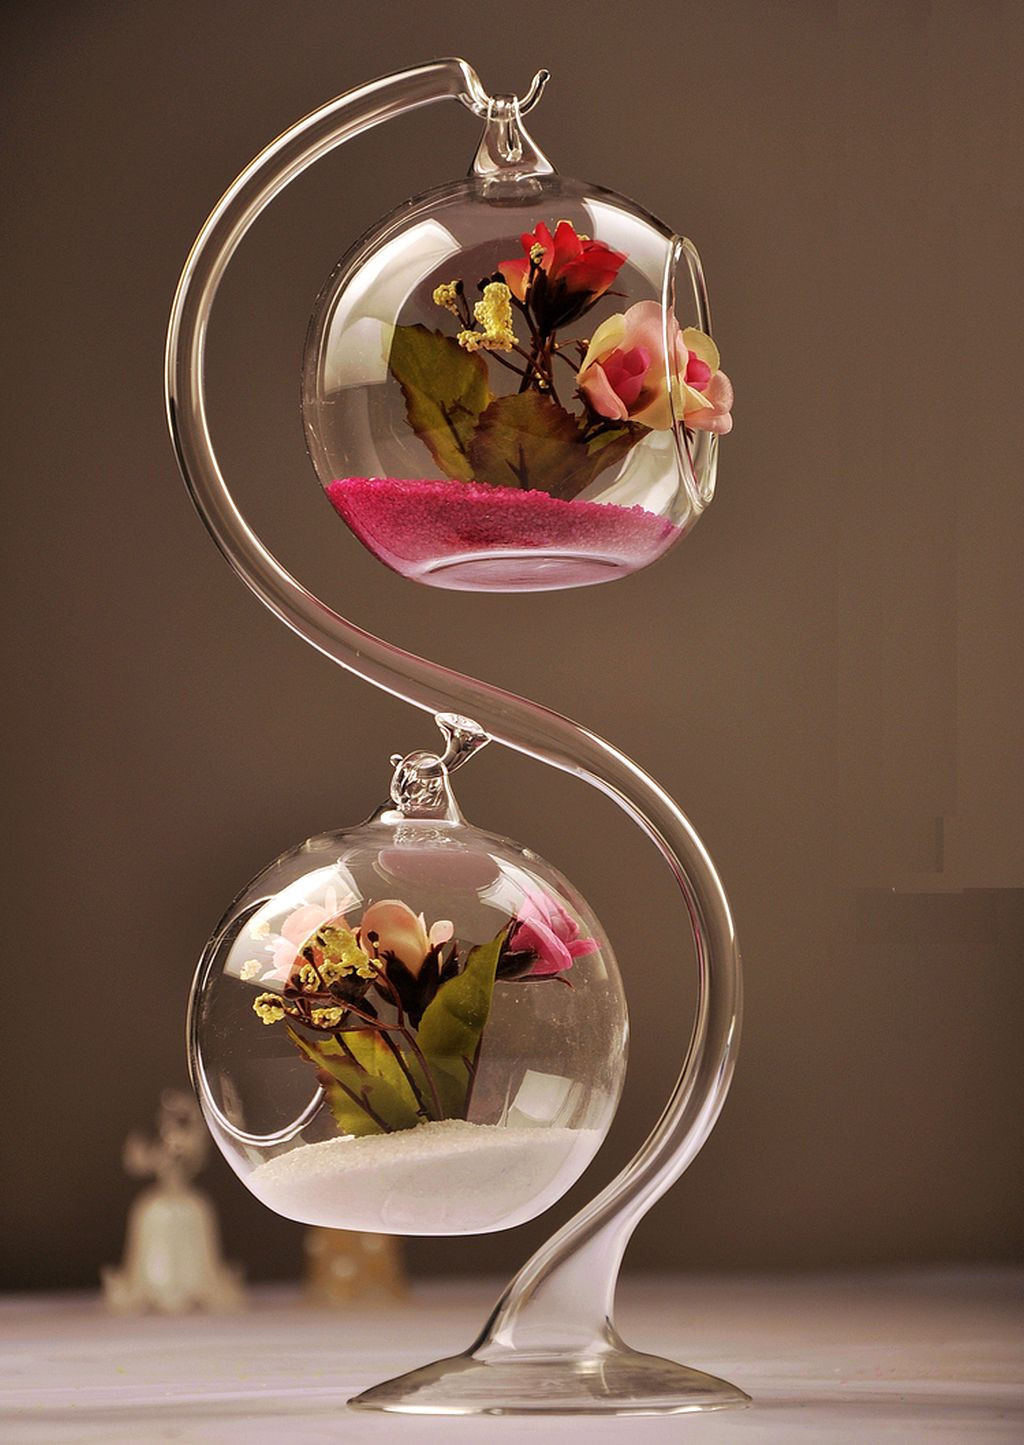 glass hanging flower vase of hanging flower vases for weddings flowers healthy pertaining to 20 lovely diy hanging flower vase ideas